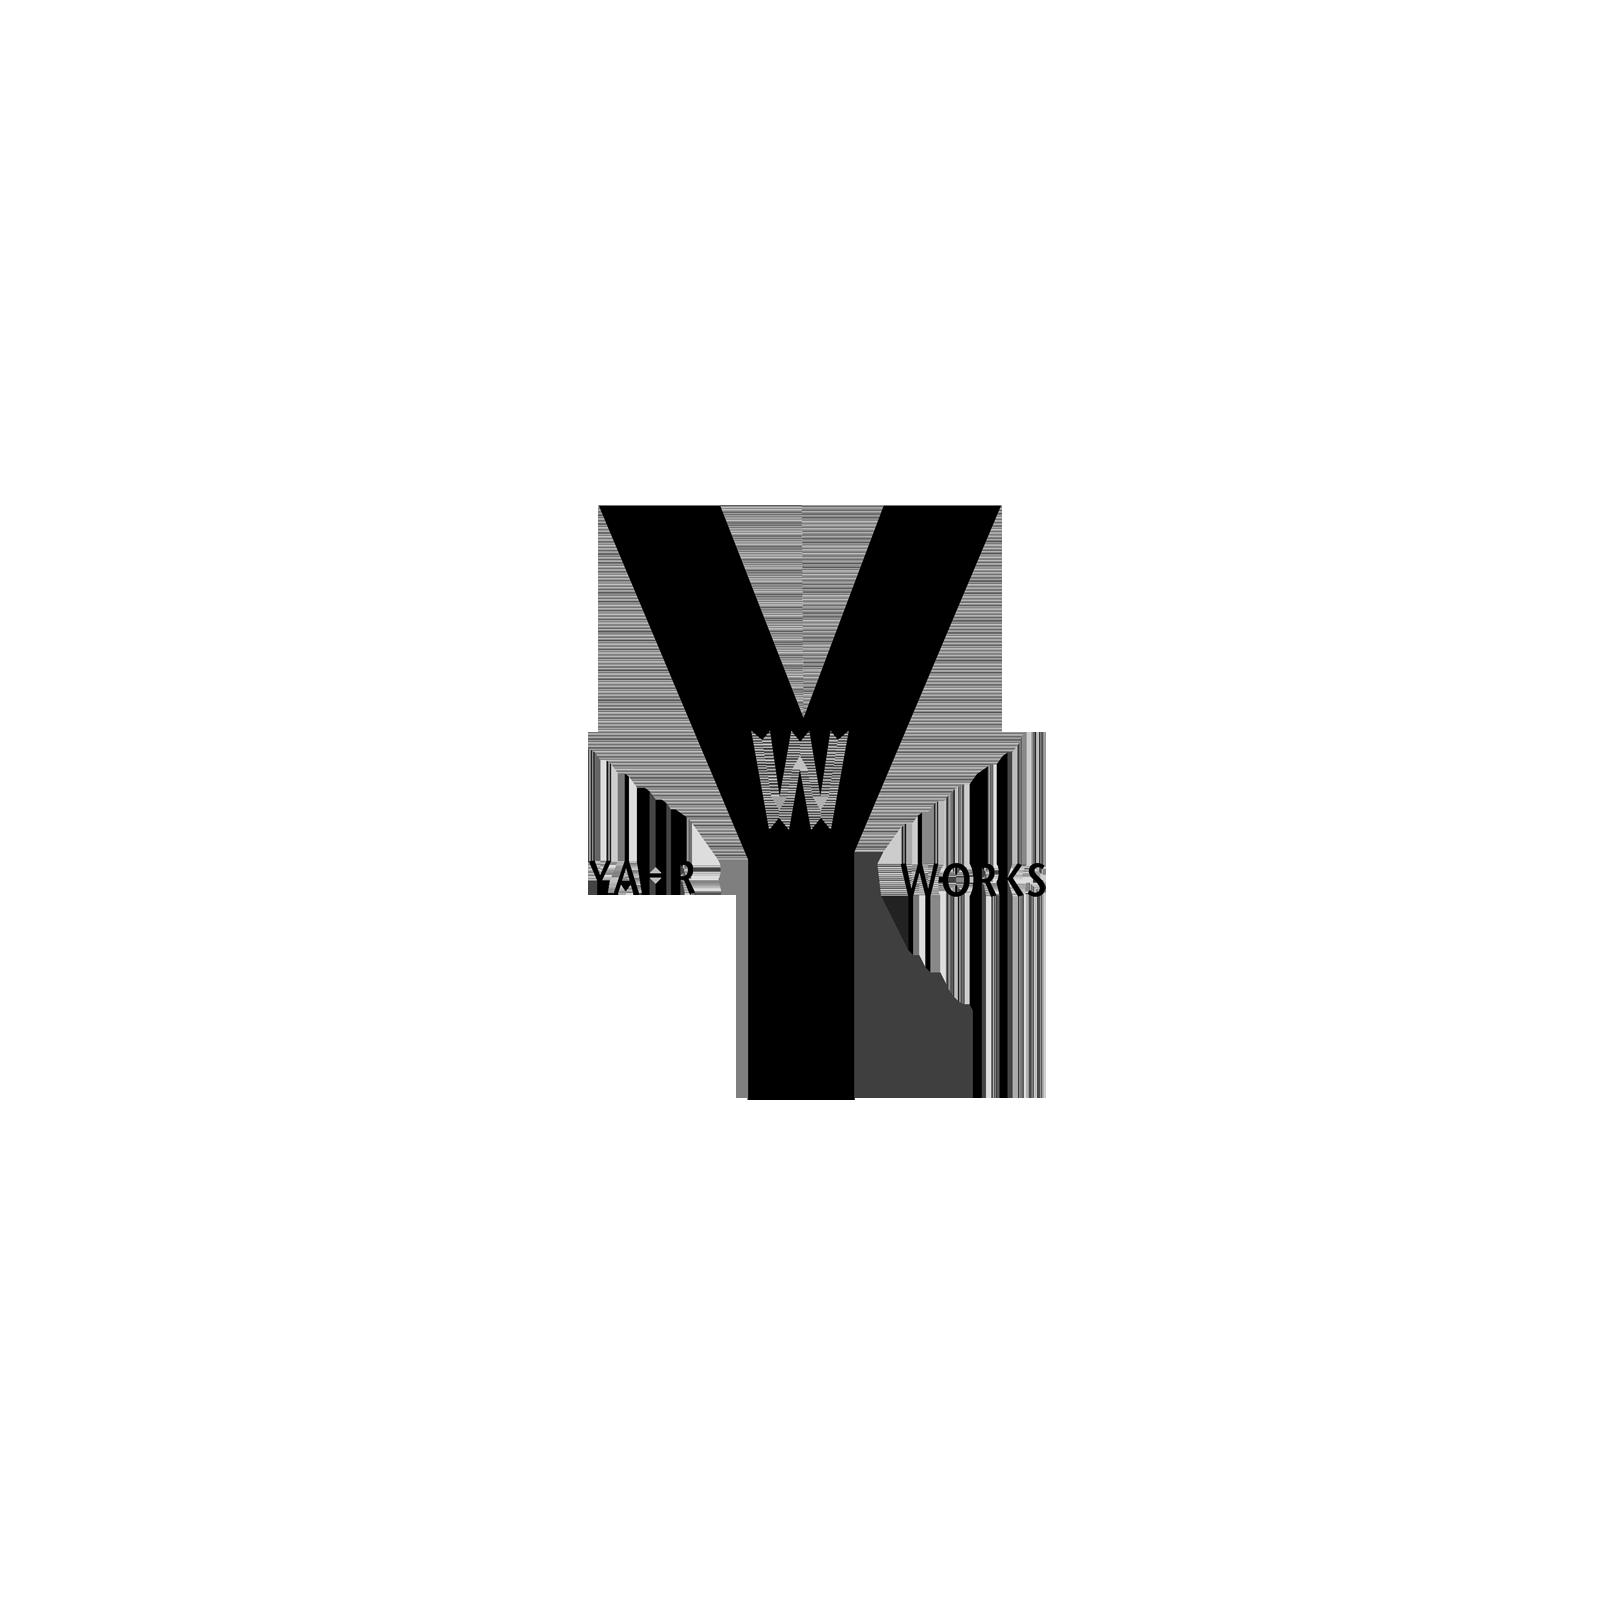 YarhWorks_logo_New_Bobbi.png